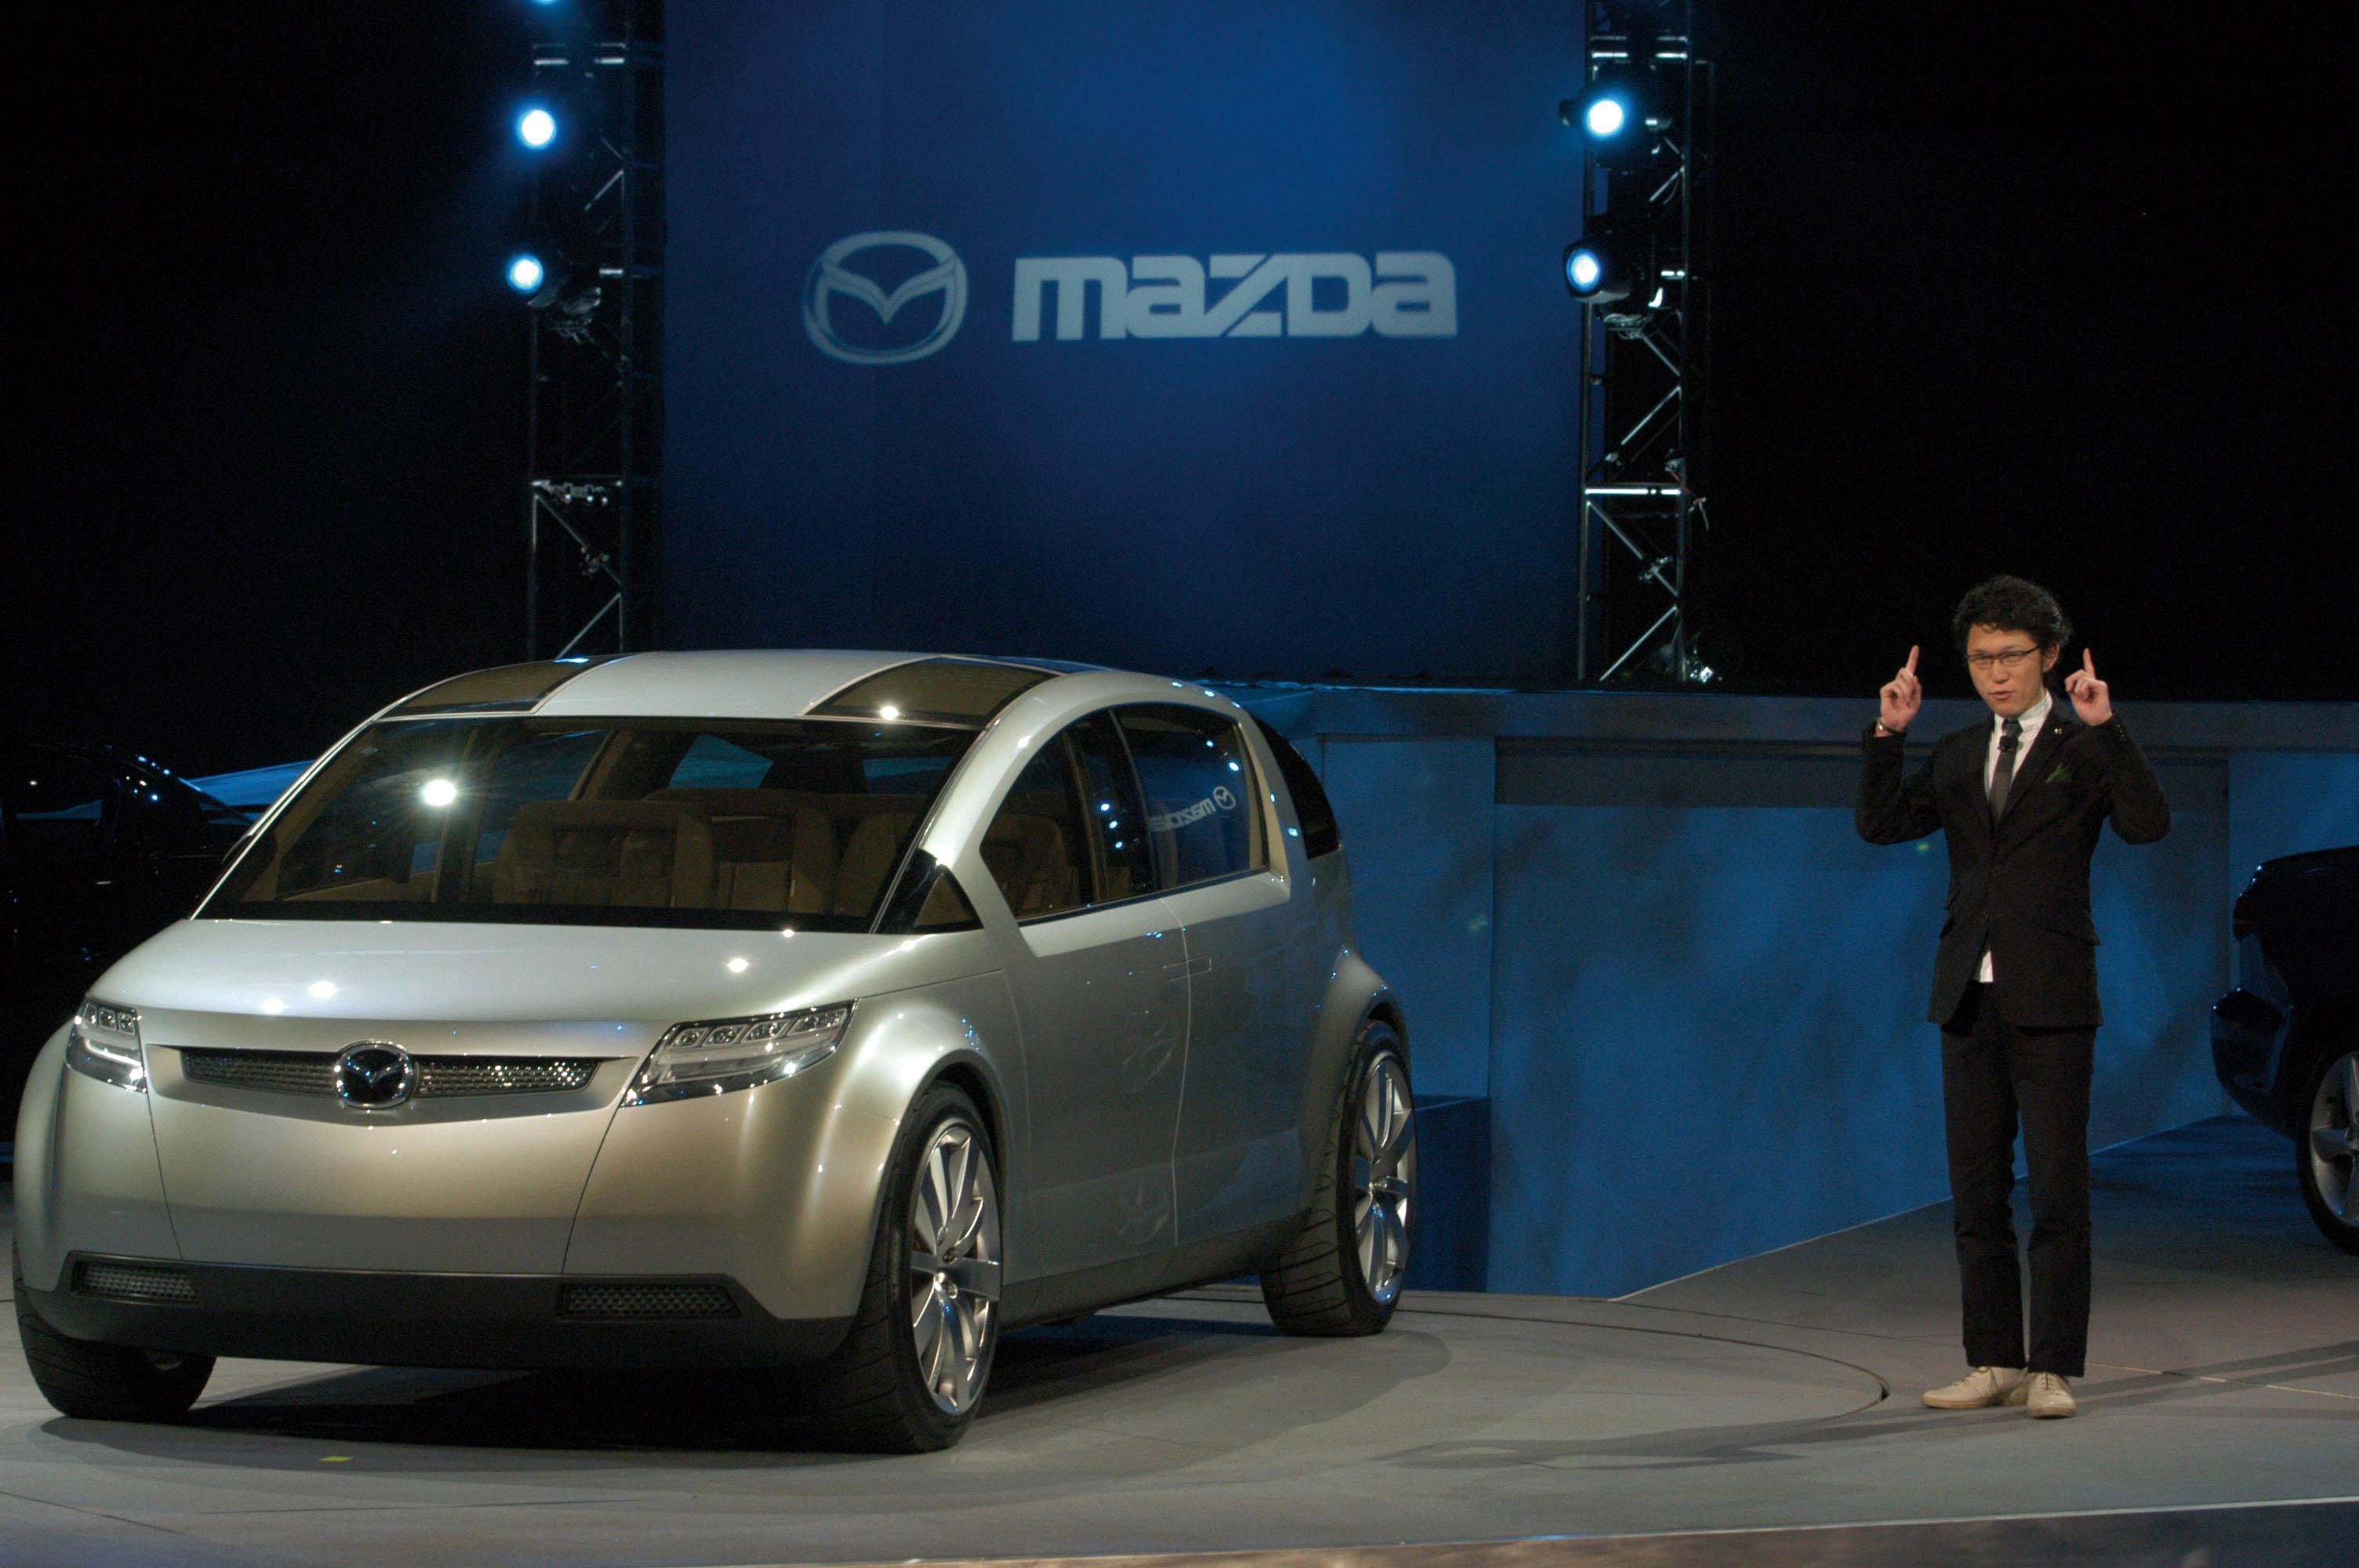 Mazda Washu Concept (50 Images) - New HD Car Wallpaper